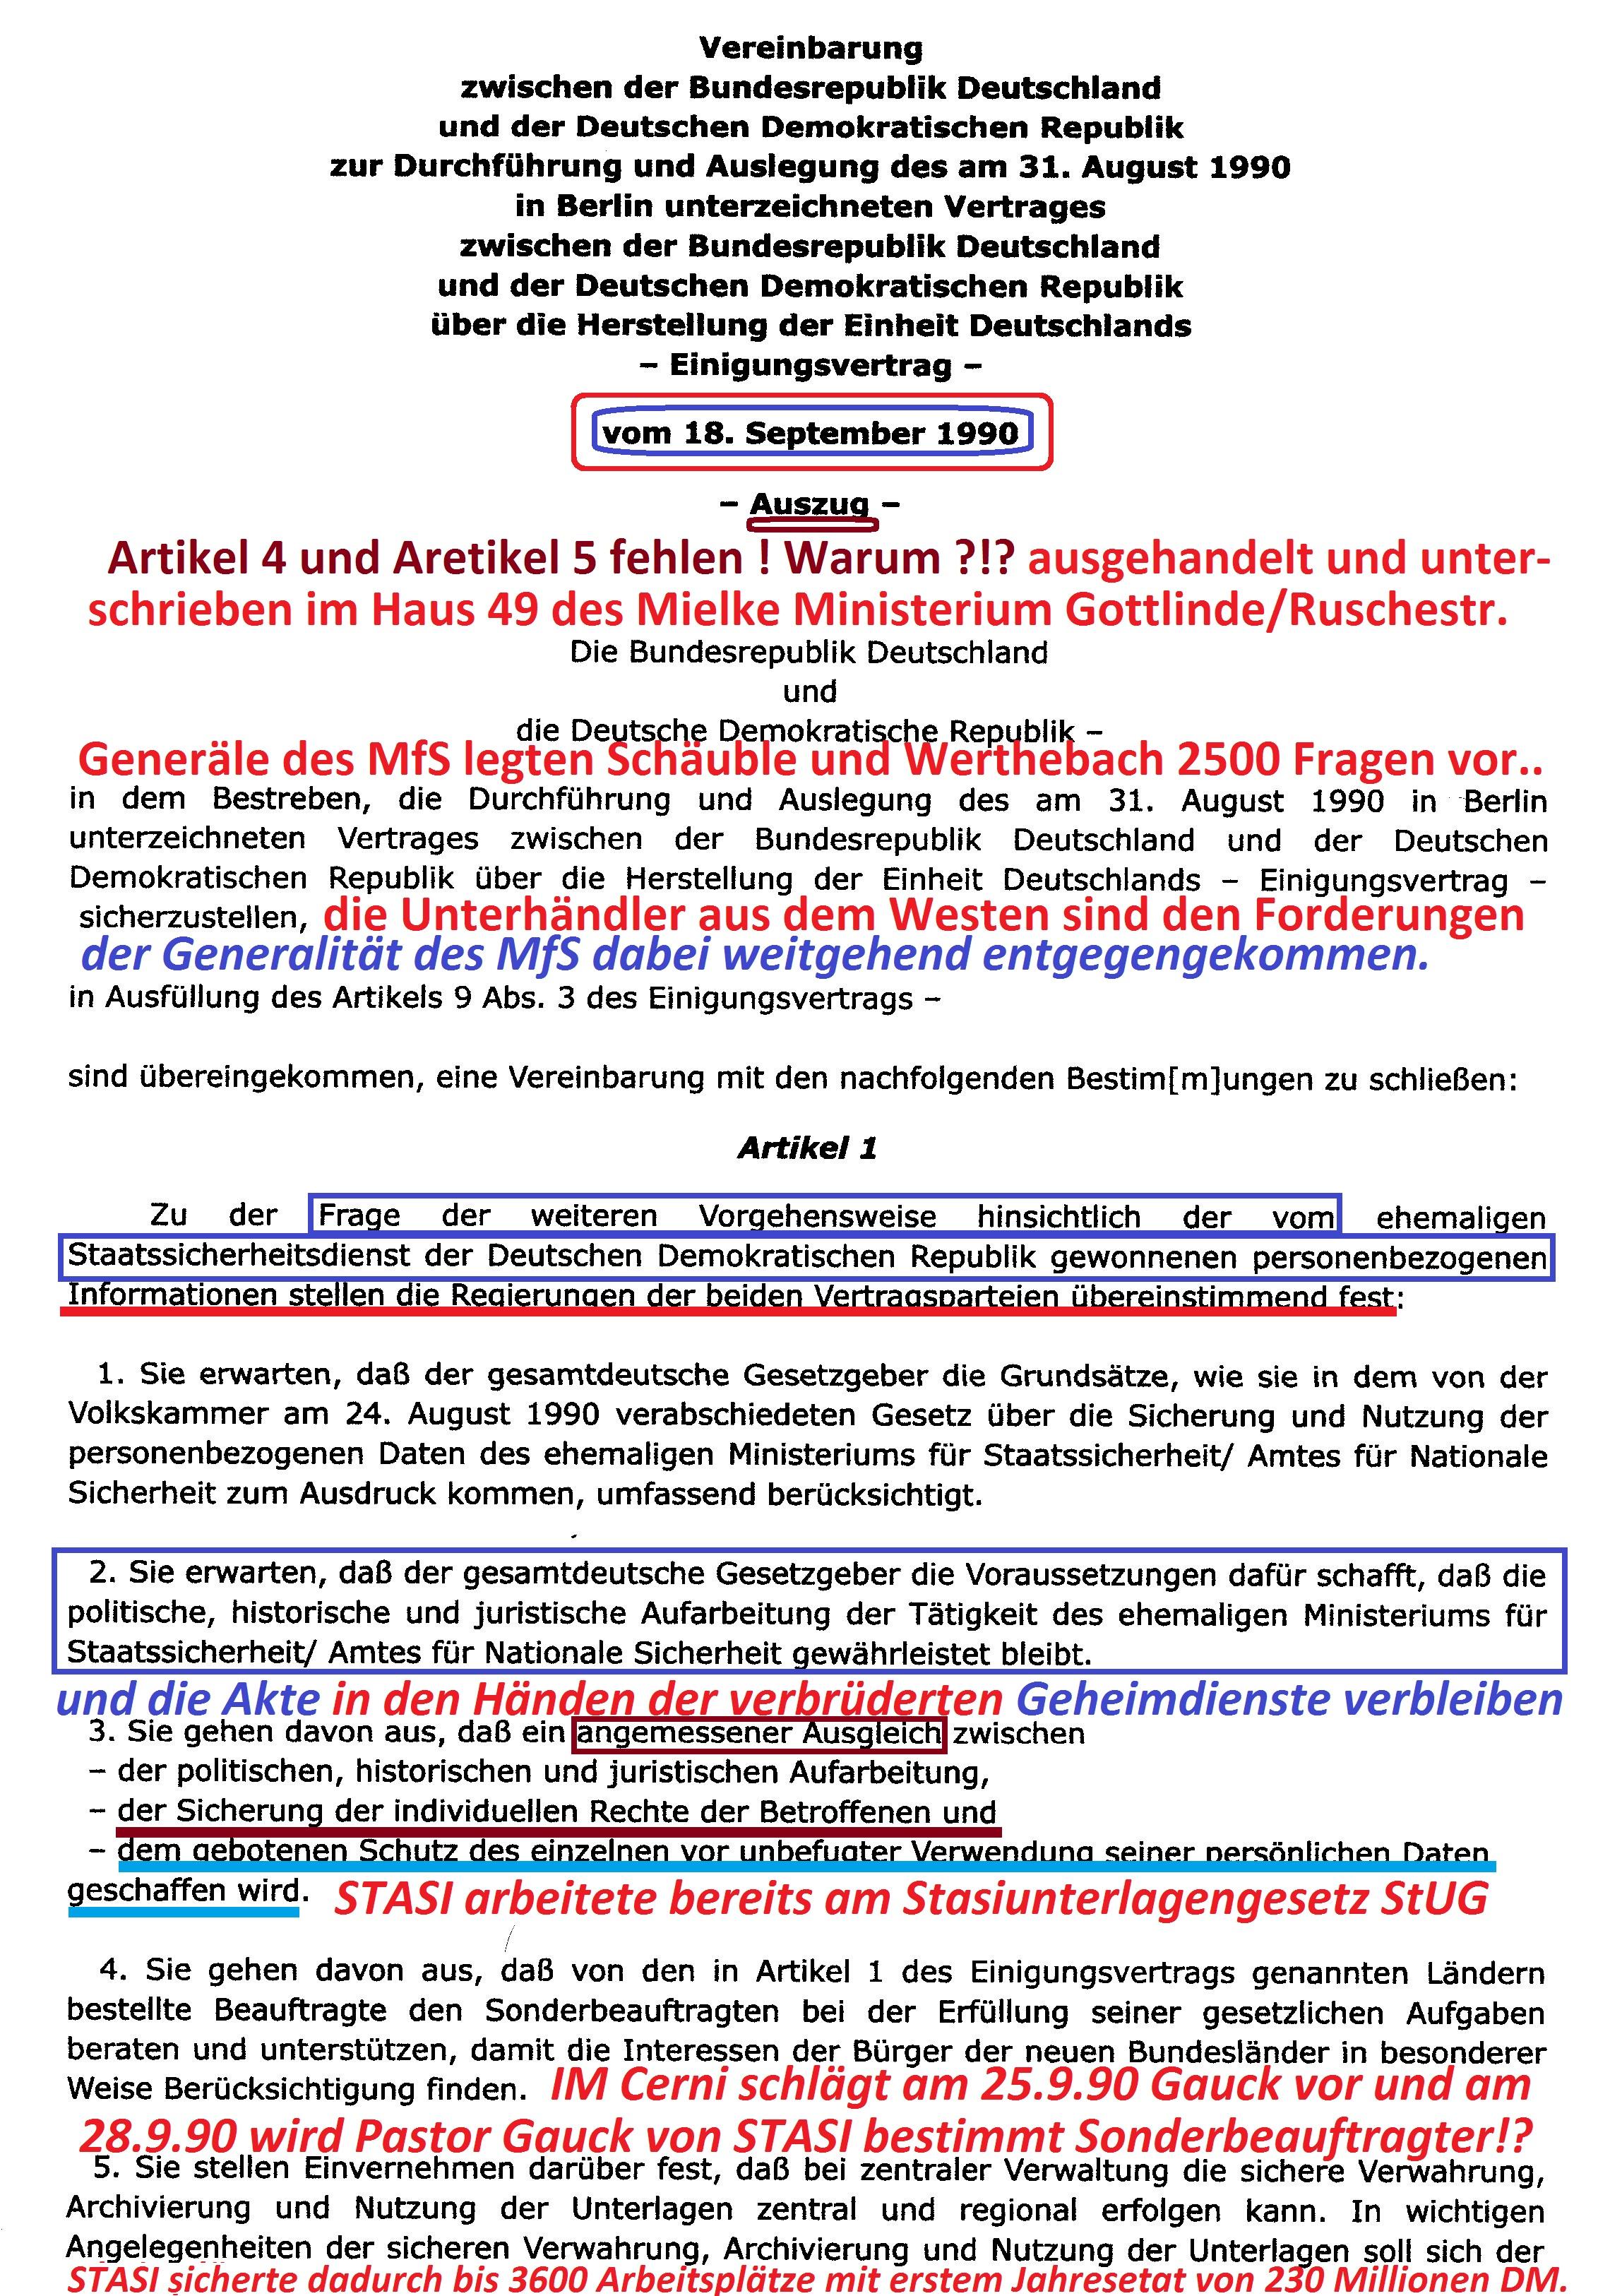 Scan_20170722 (5).jpg